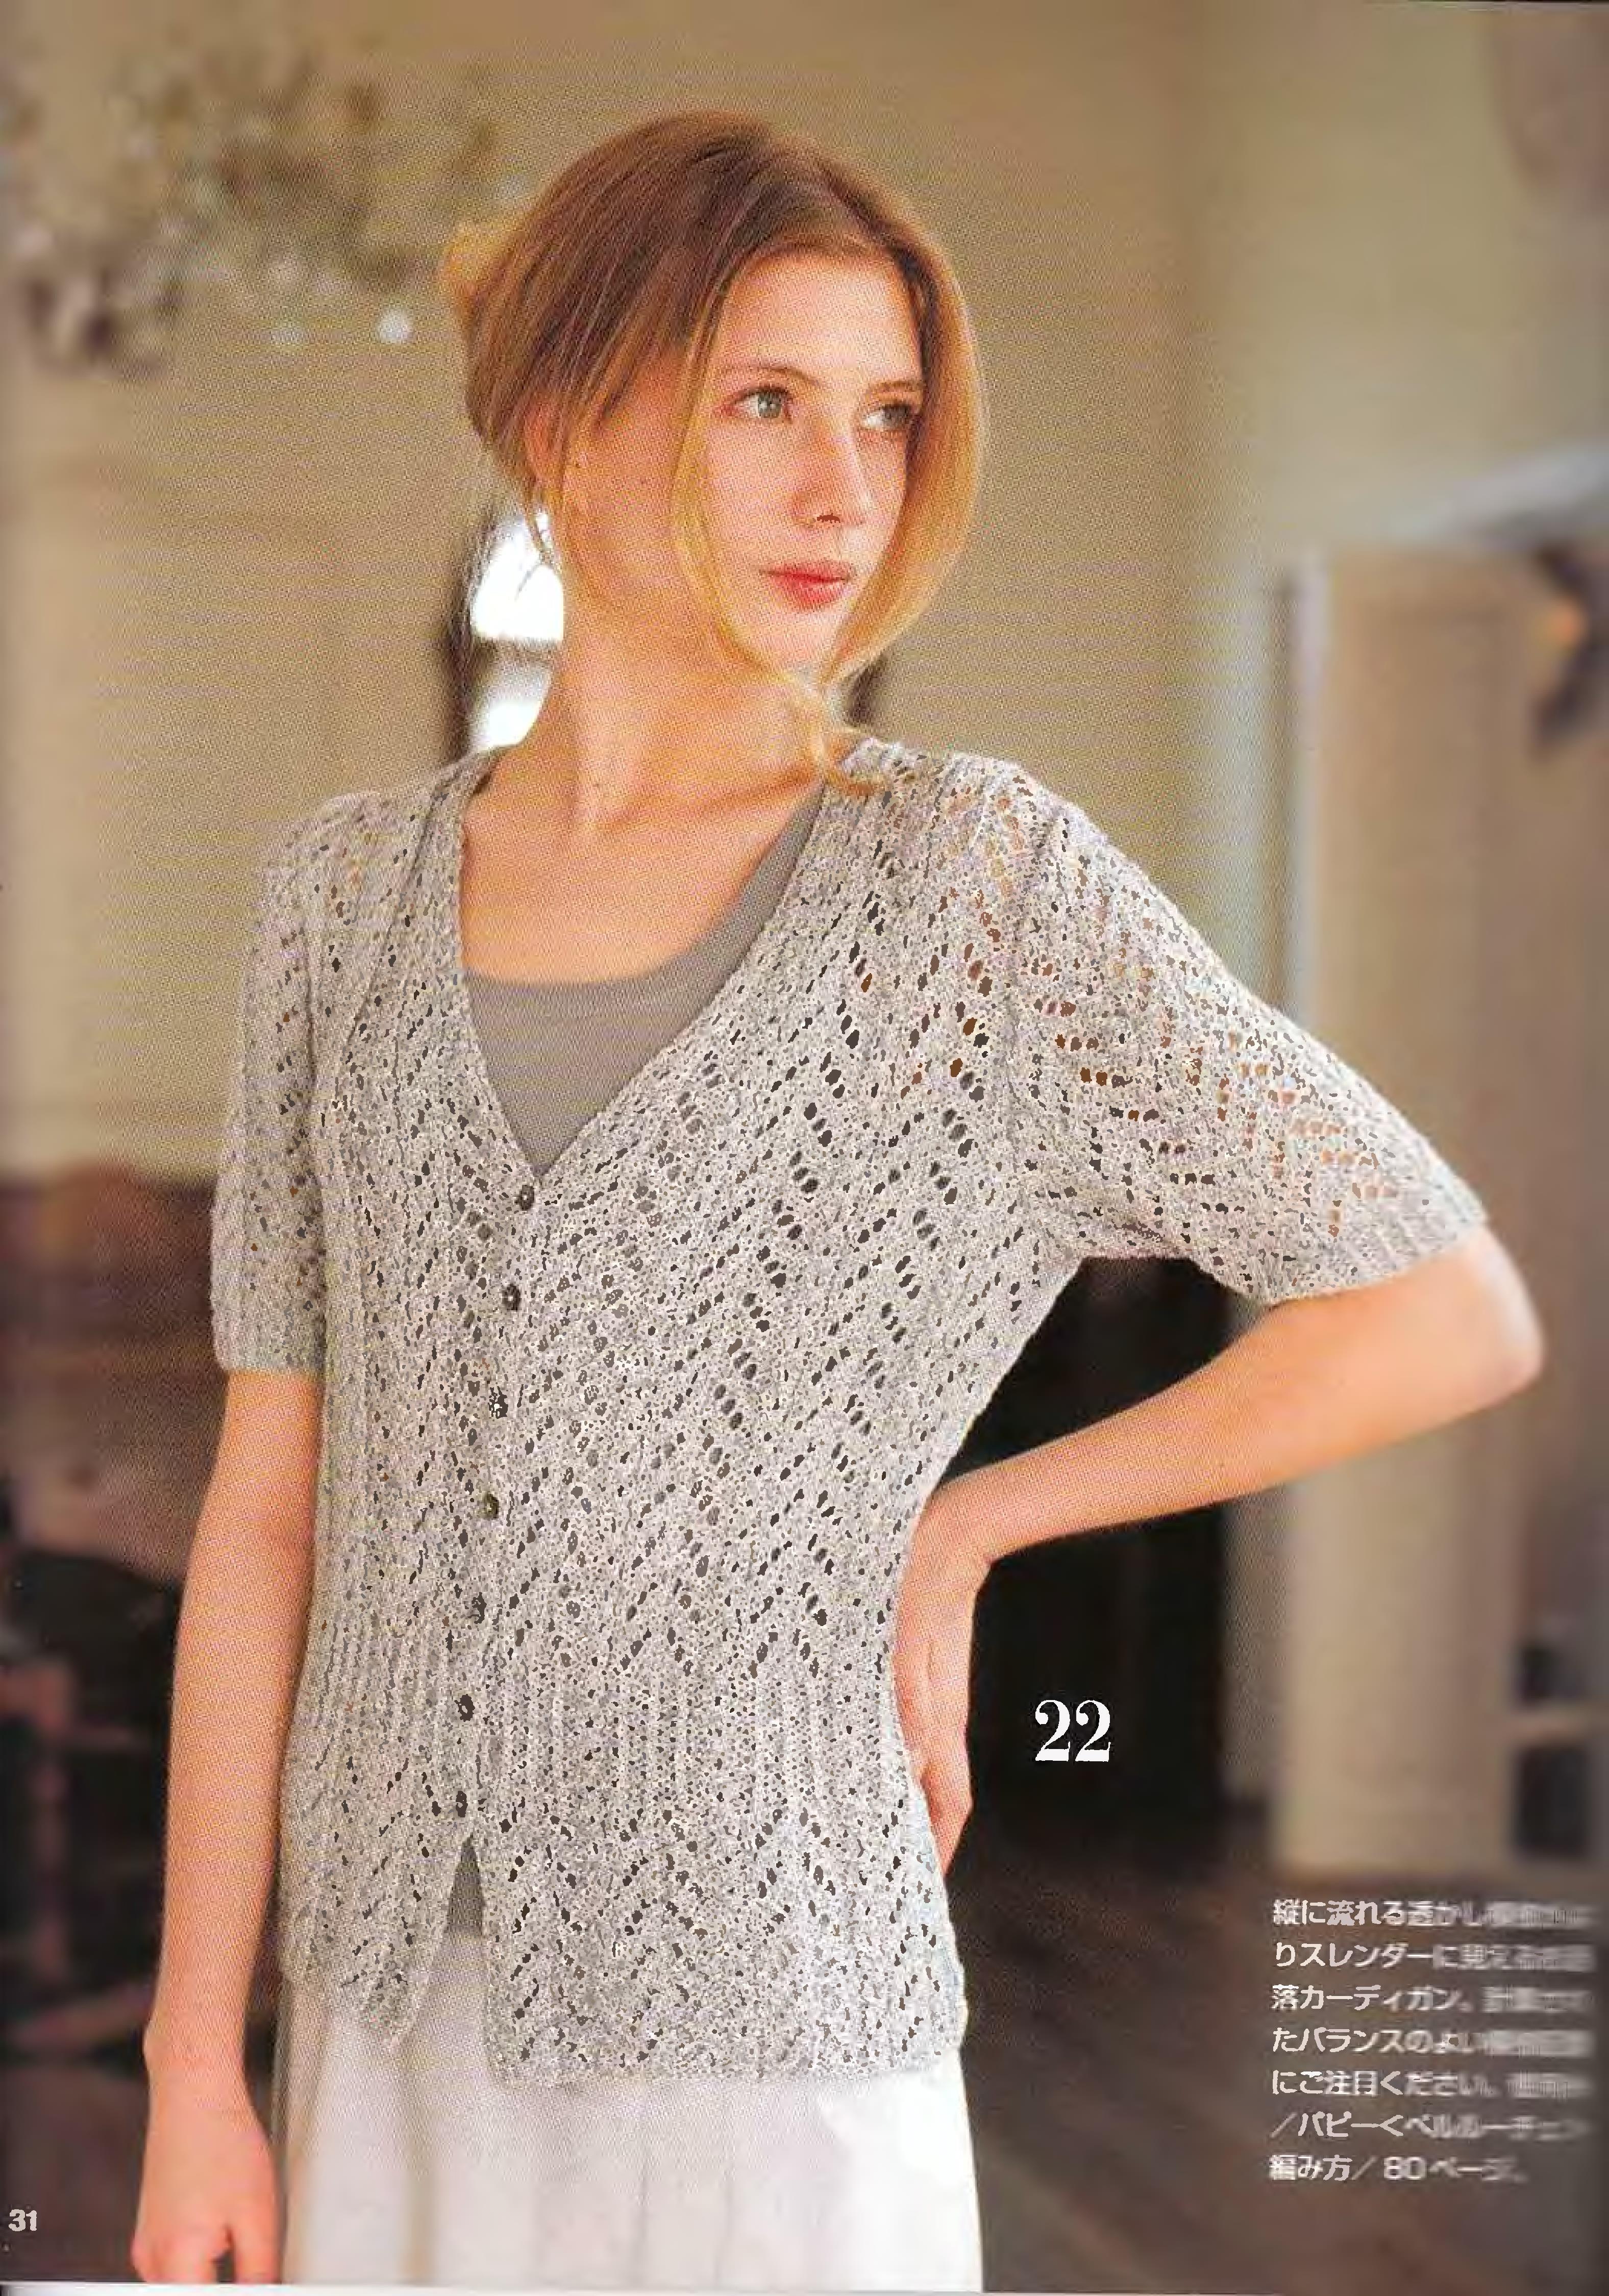 Lets-knit-series-NV4359-2008-Spring-Summer-sp-kr_29.jpg